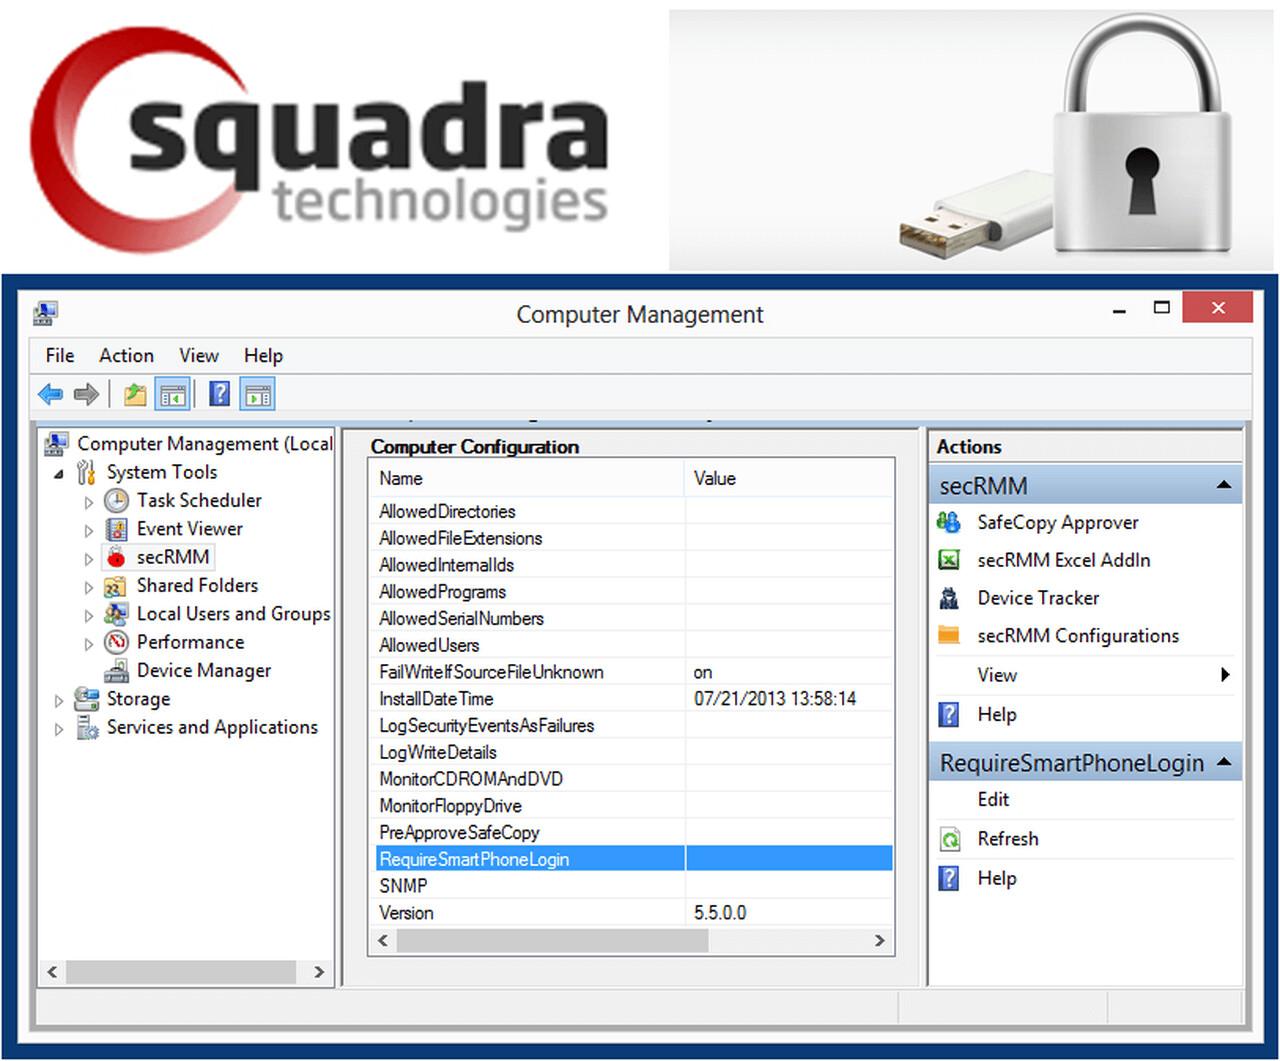 secRMM Data Loss Prevention (DLP) software